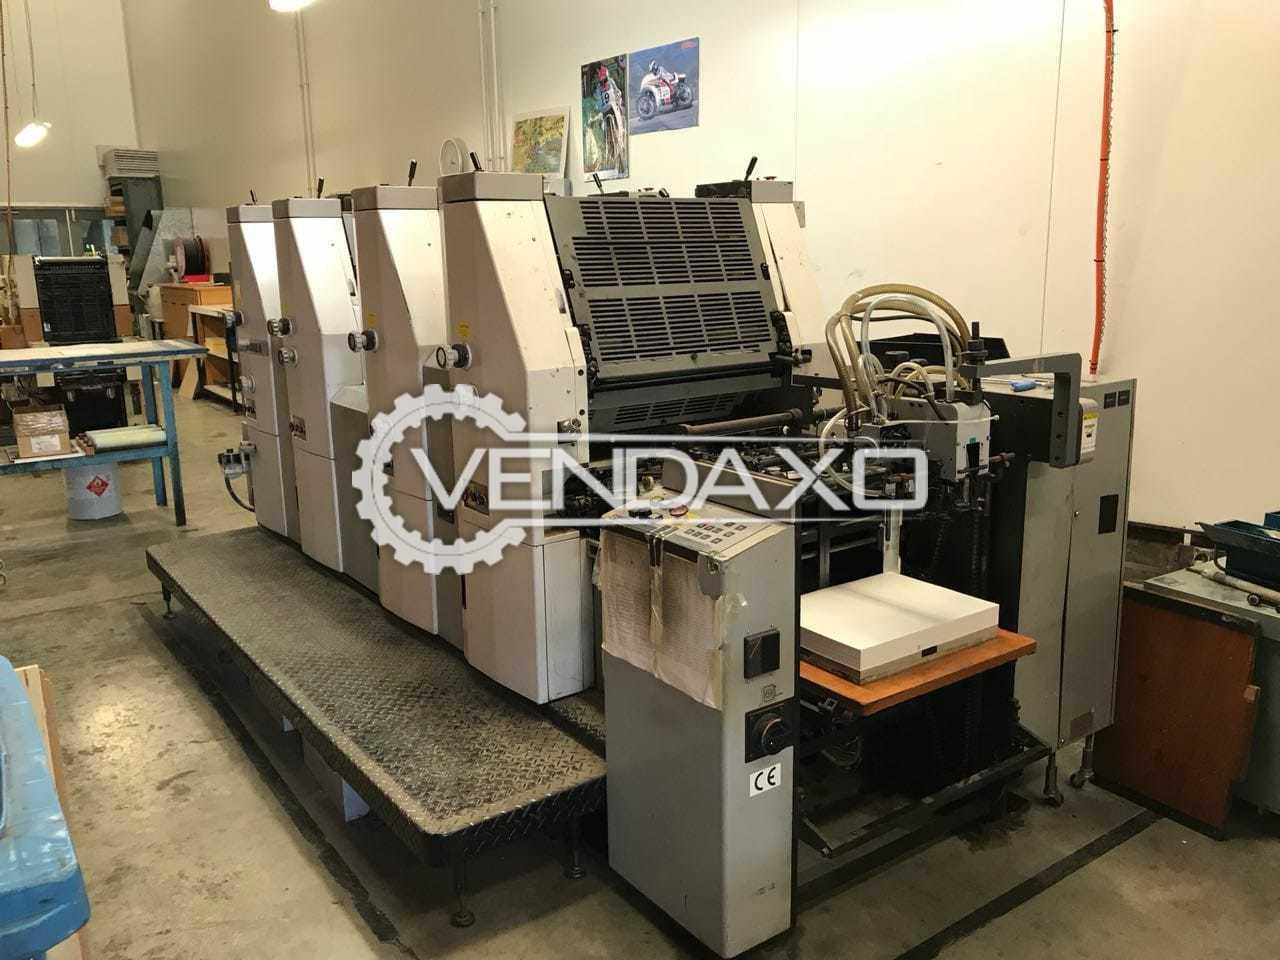 Hamada 452A Offset Printing Machine - 15 X 20 Inch, 4 Color